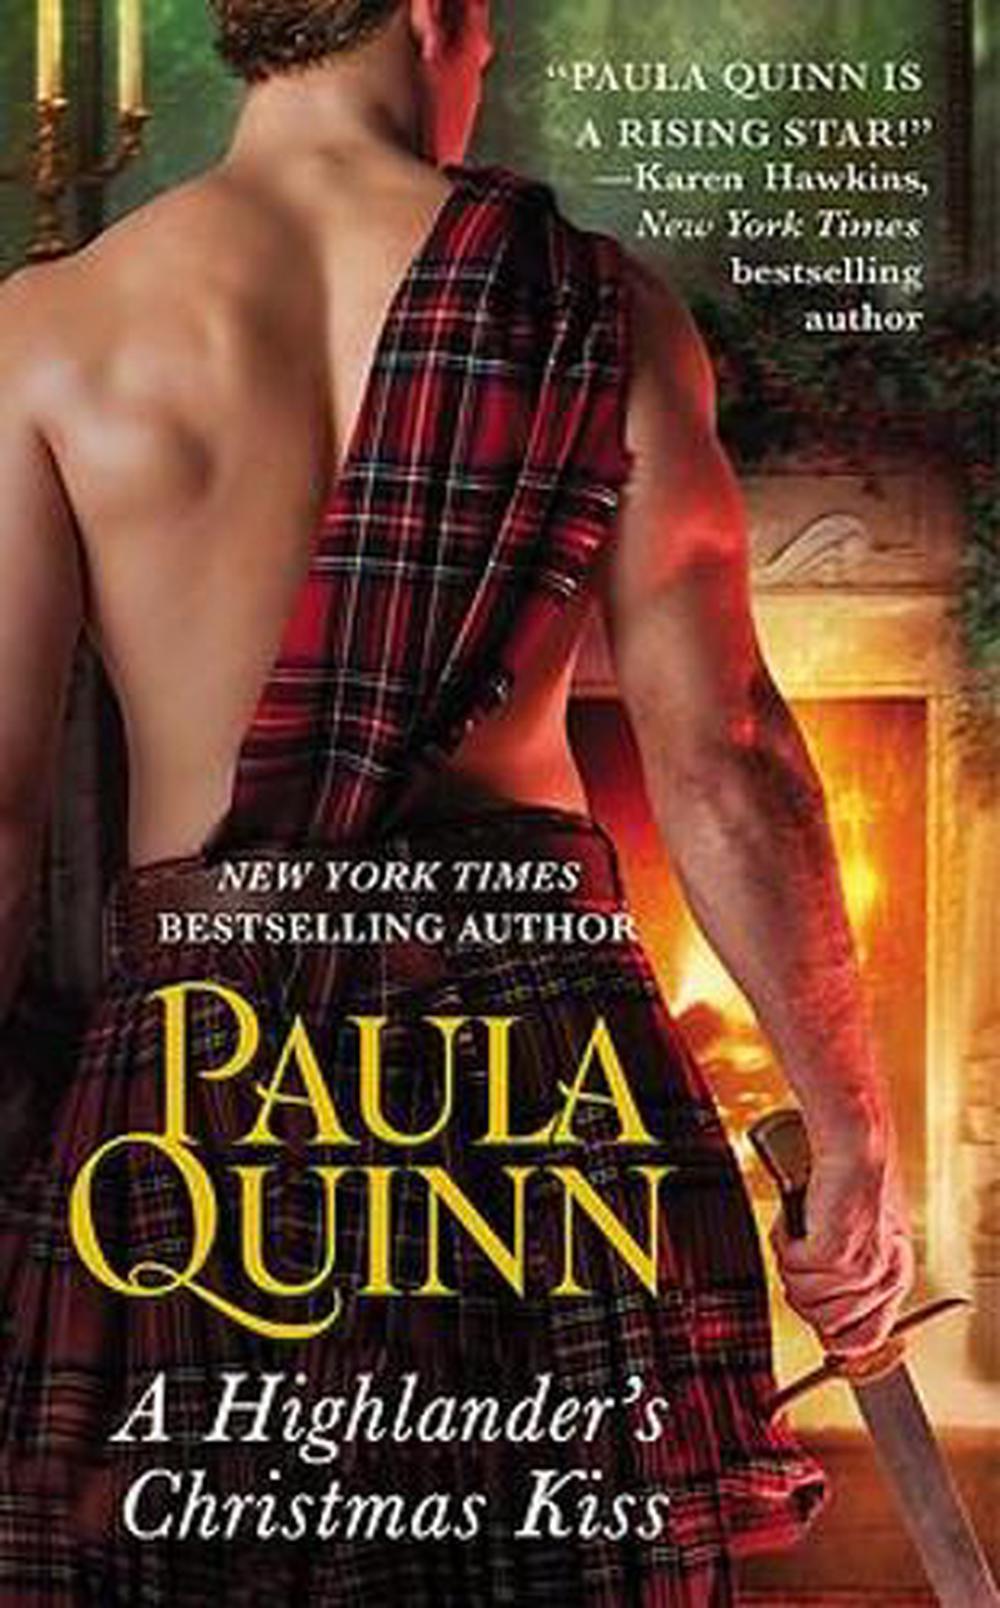 A Highlander's Christmas Kiss by Paula Quinn - book review